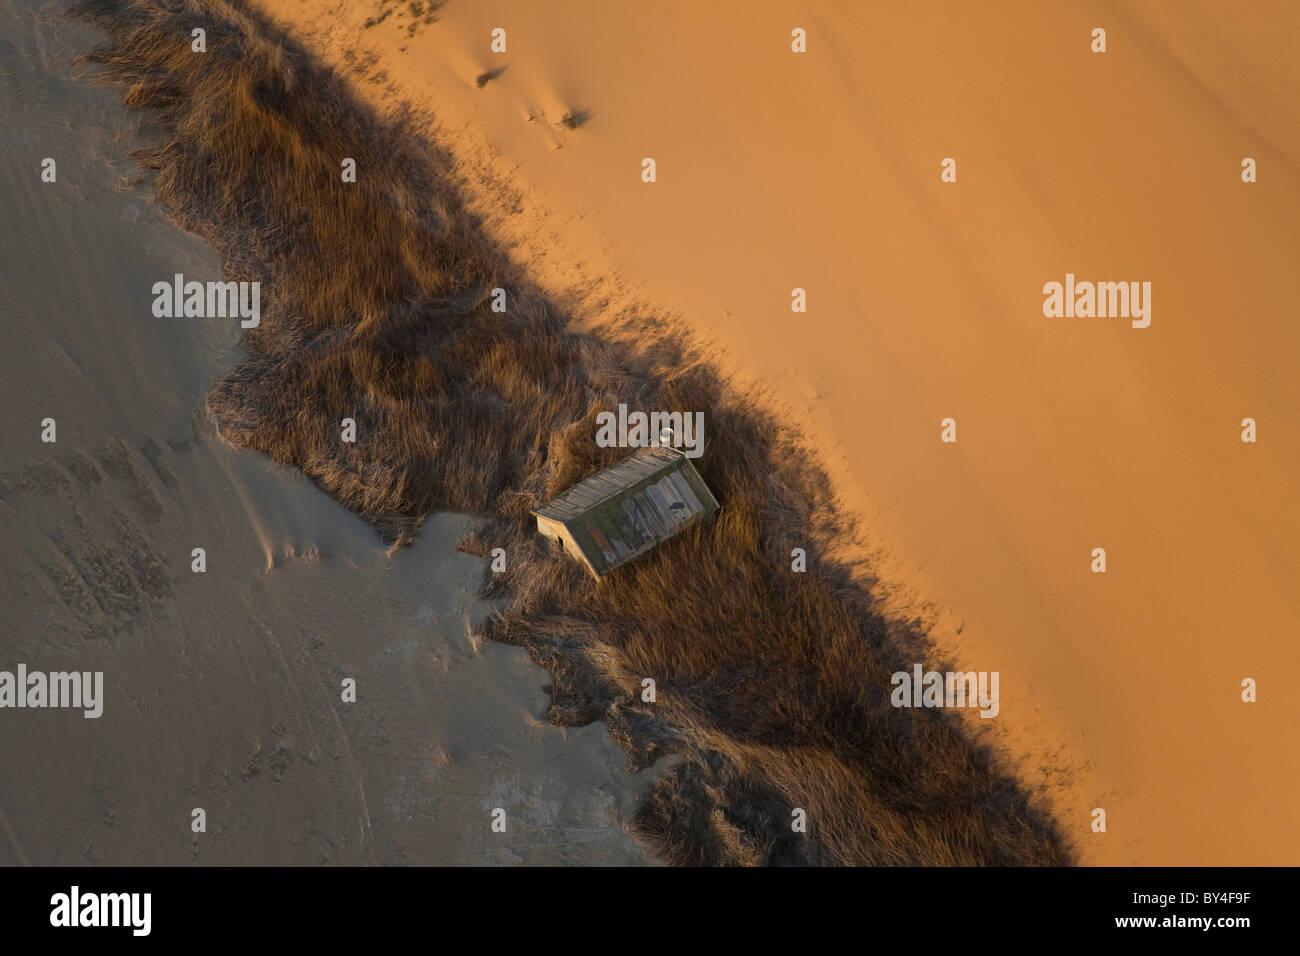 Hut buried by sand, Aerial view, Skelton Coast, Namib Naukluft Nat Park, Namib Desert, Namibia - Stock Image